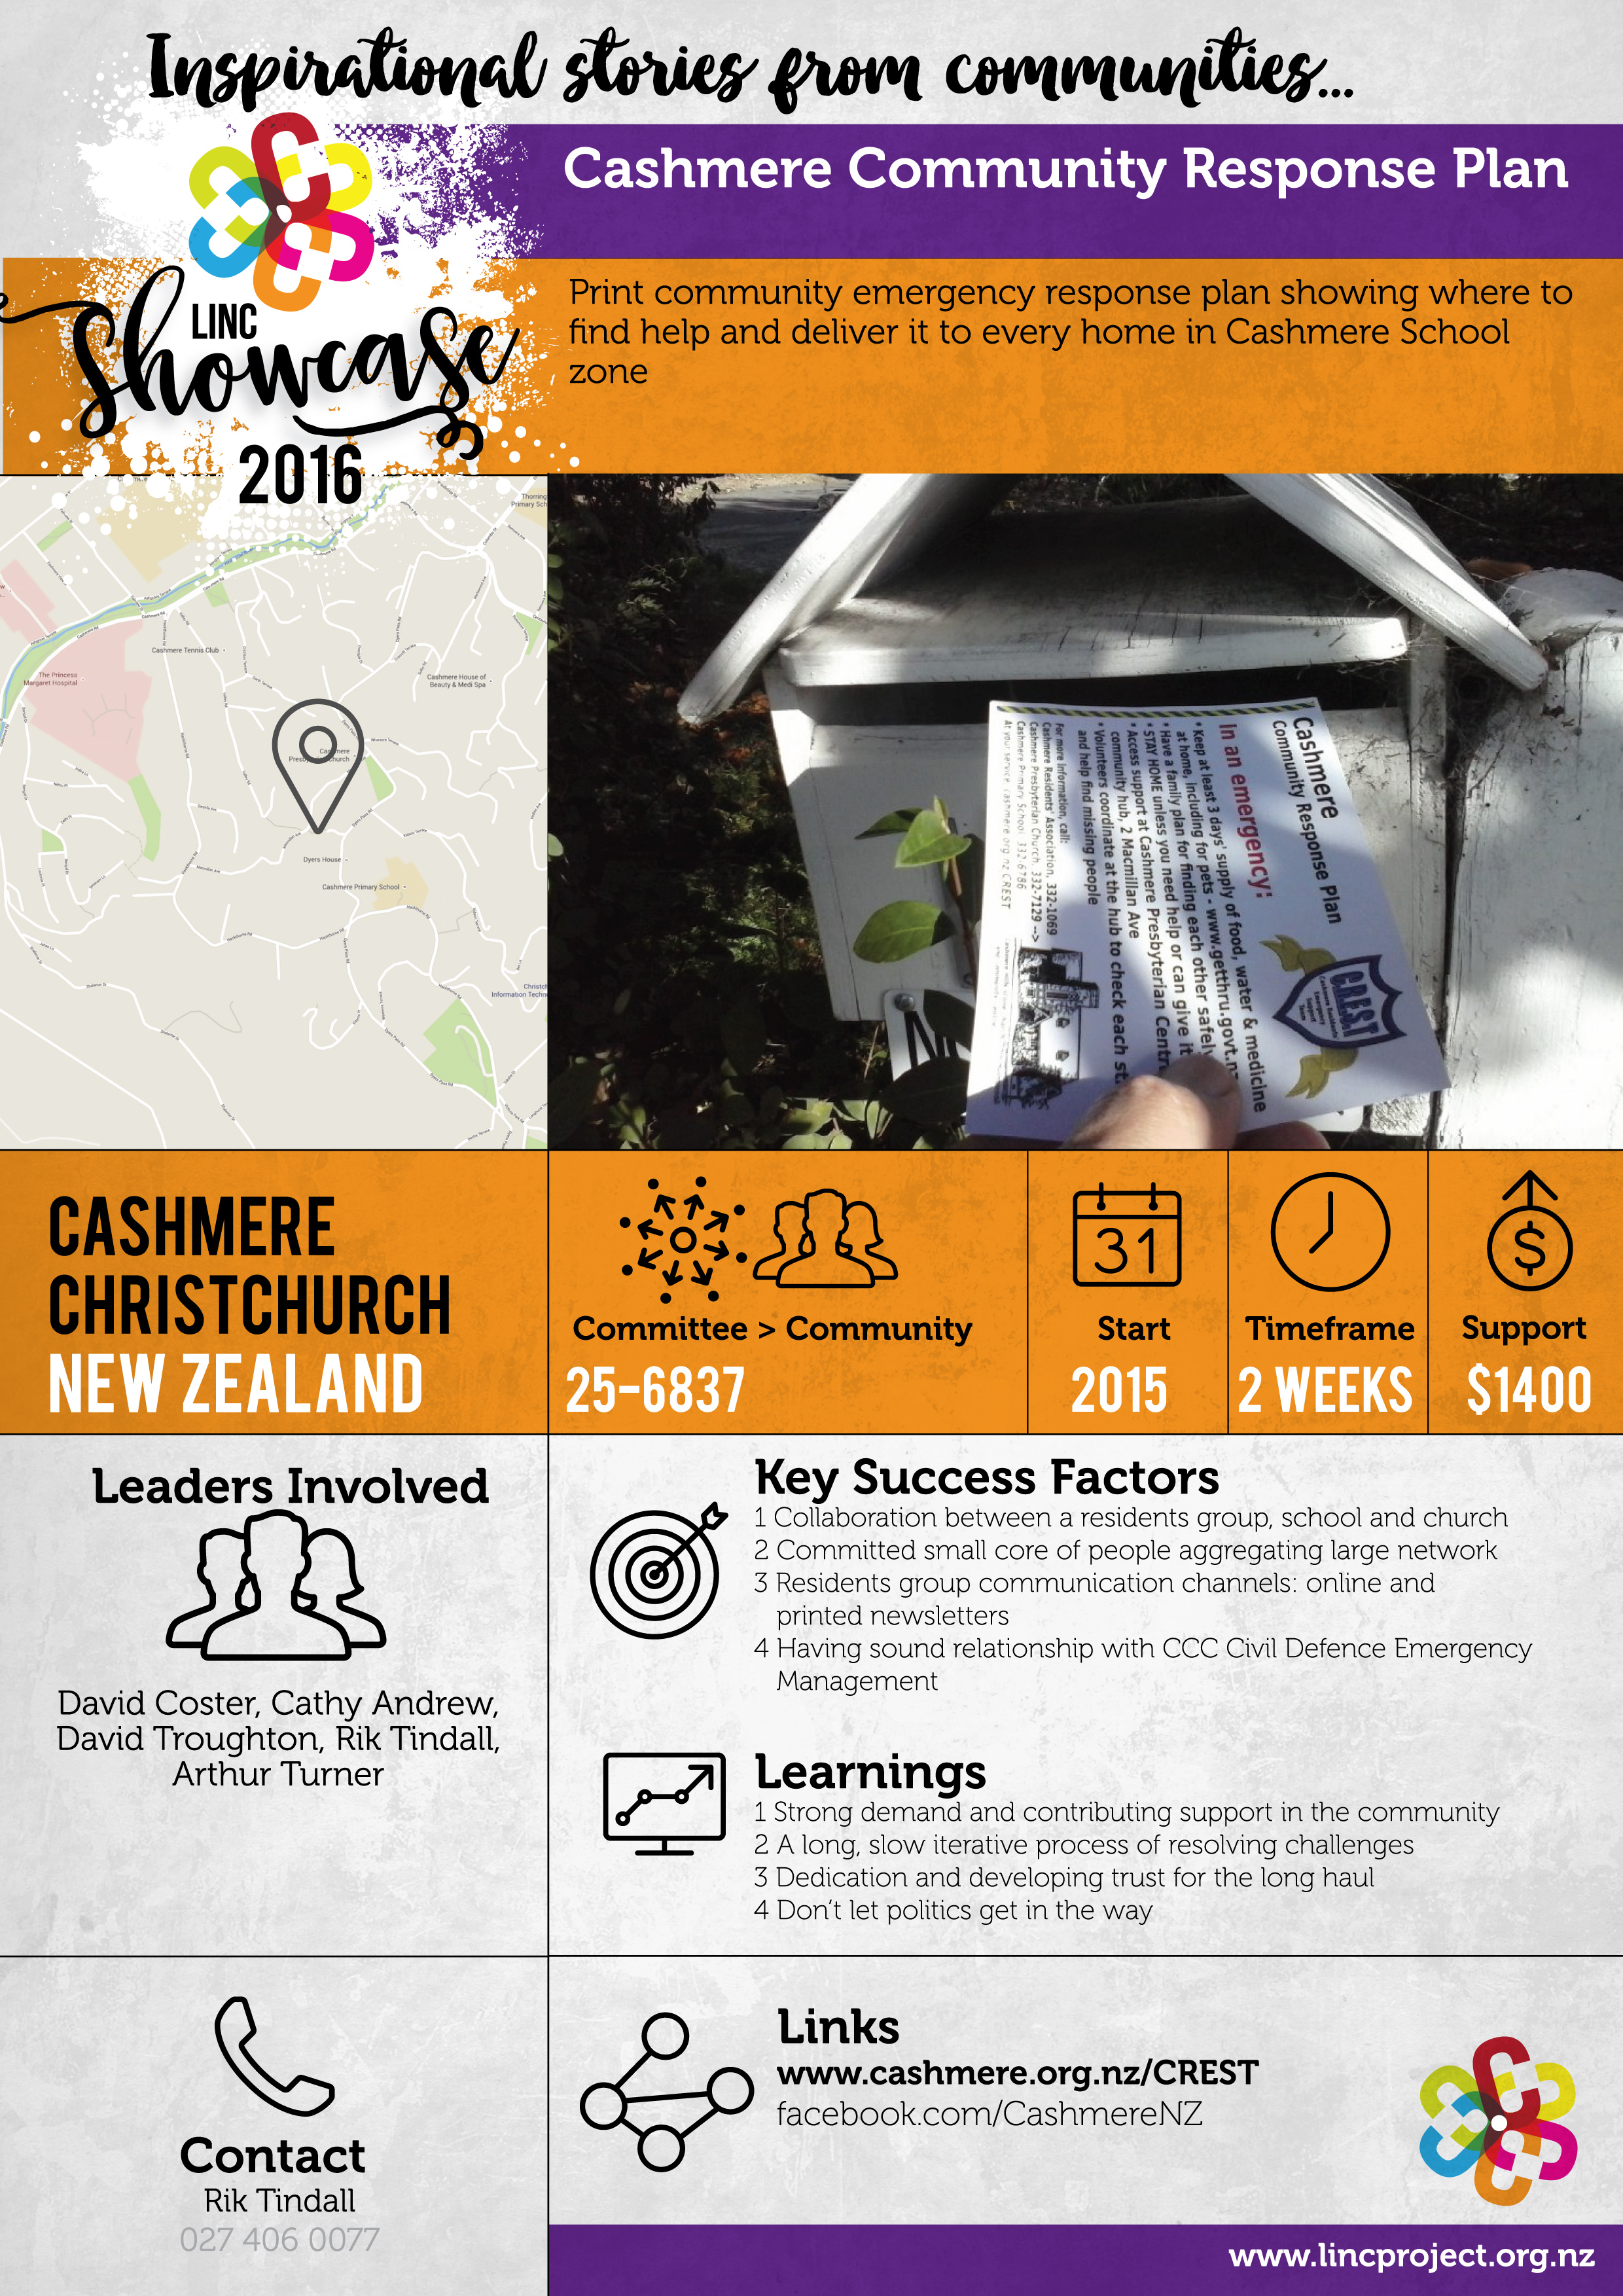 Cashmere Community Response Plan